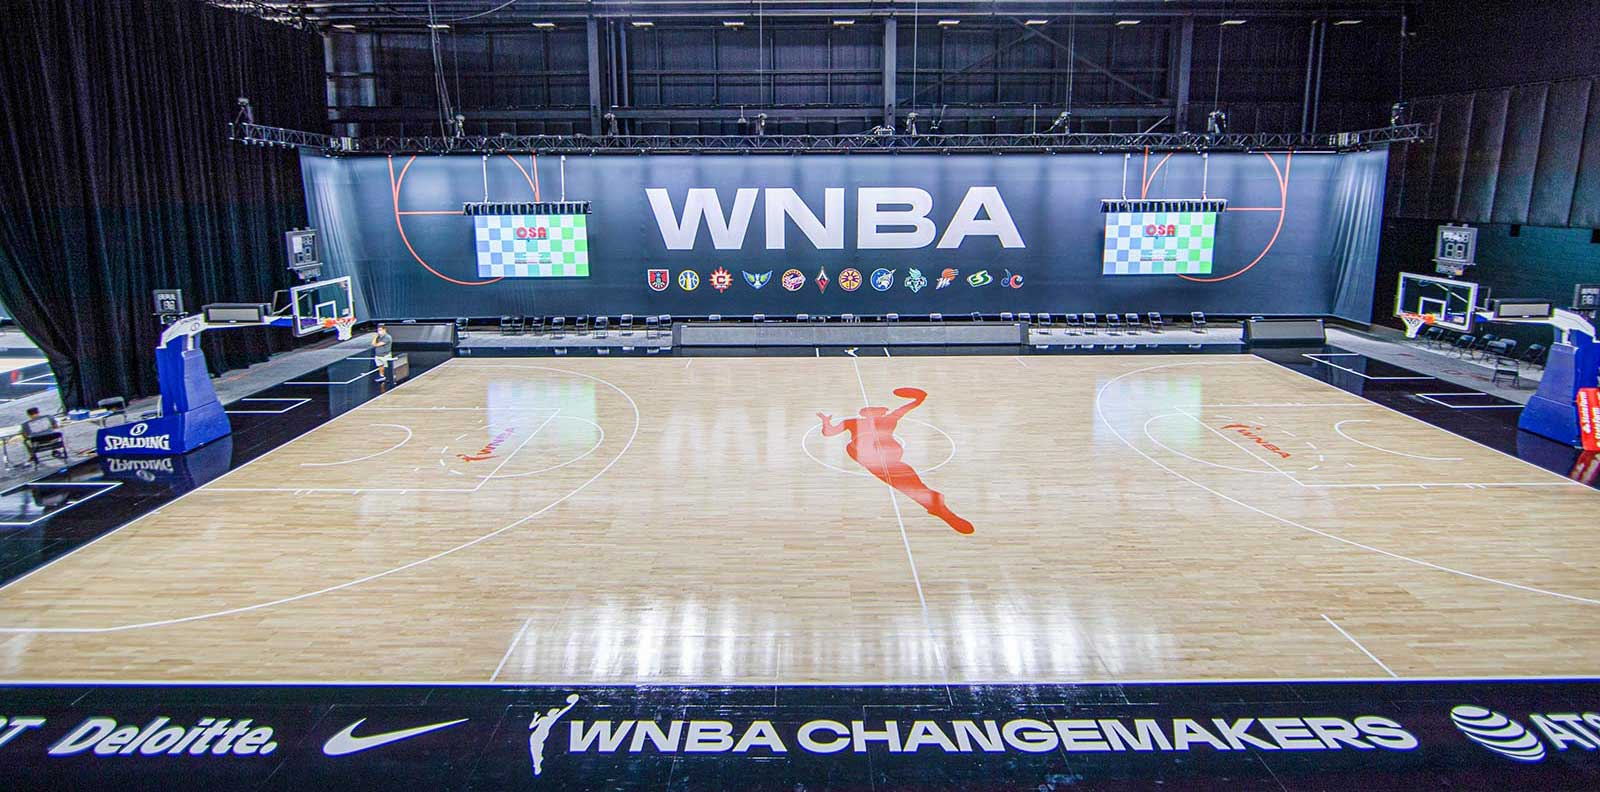 WNBA season is a case study in sound economic development